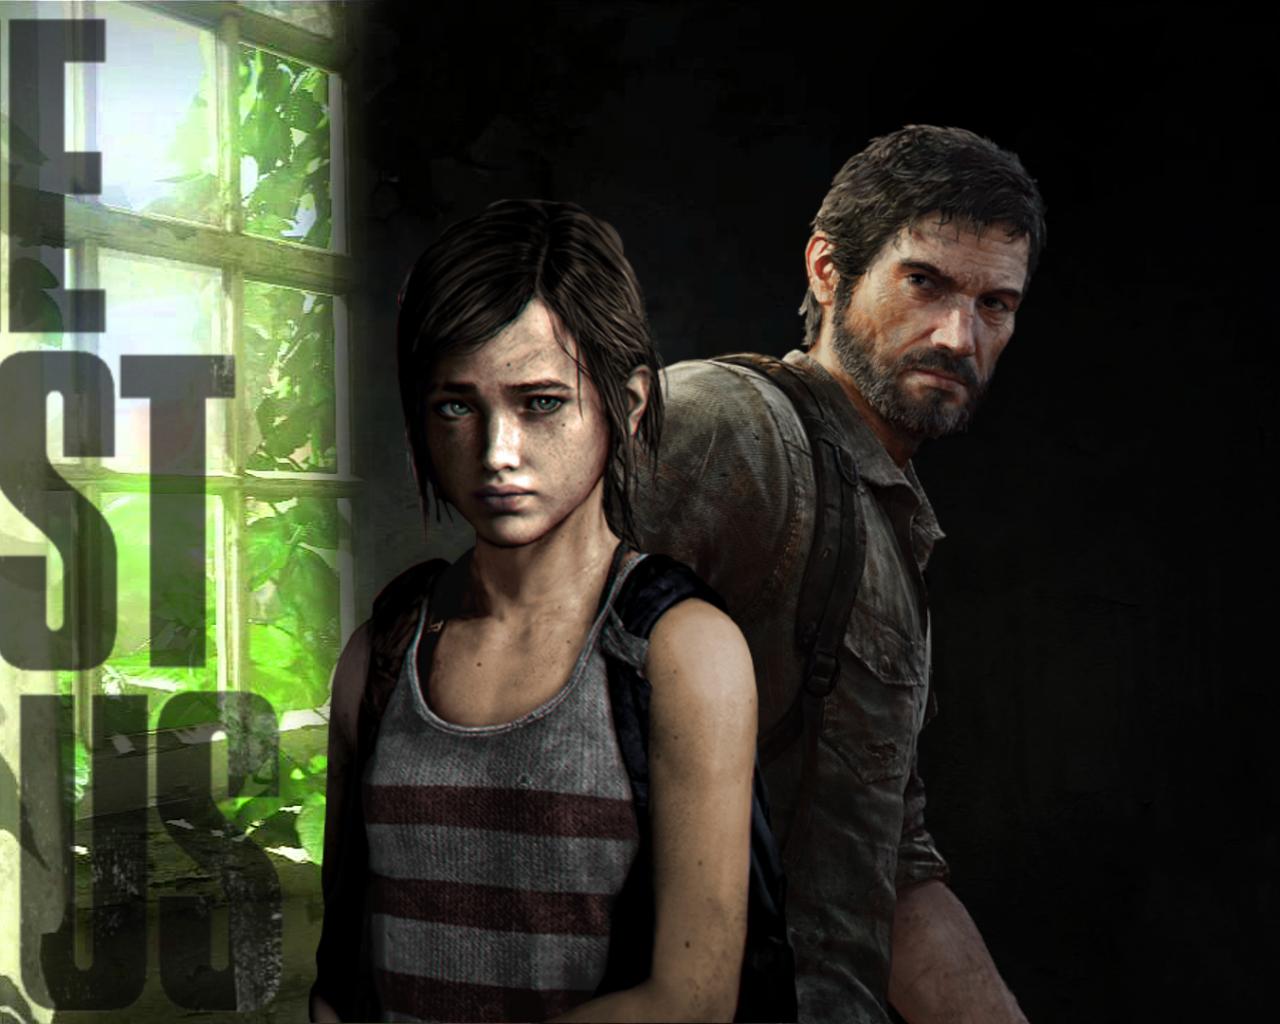 Free Download The Last Of Us Desktop Wallpaper 1920x1080 By Repilc